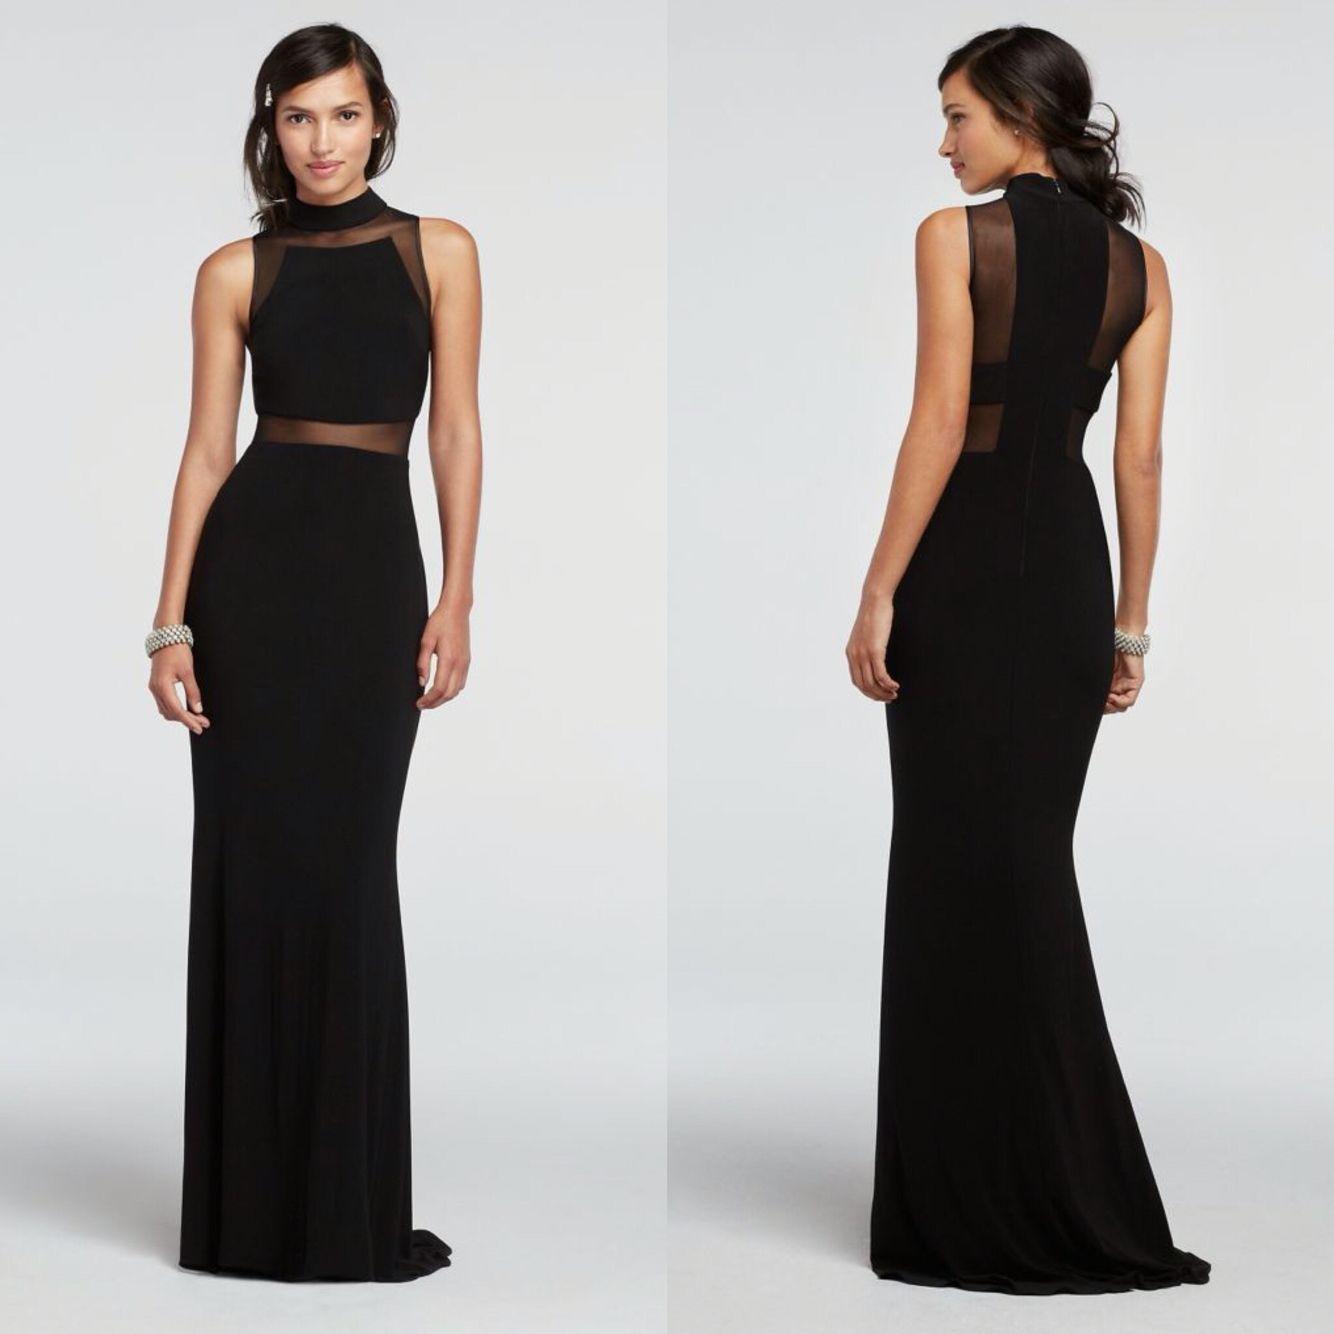 David S Bridal Prom Dress Black With Sheer Illusion